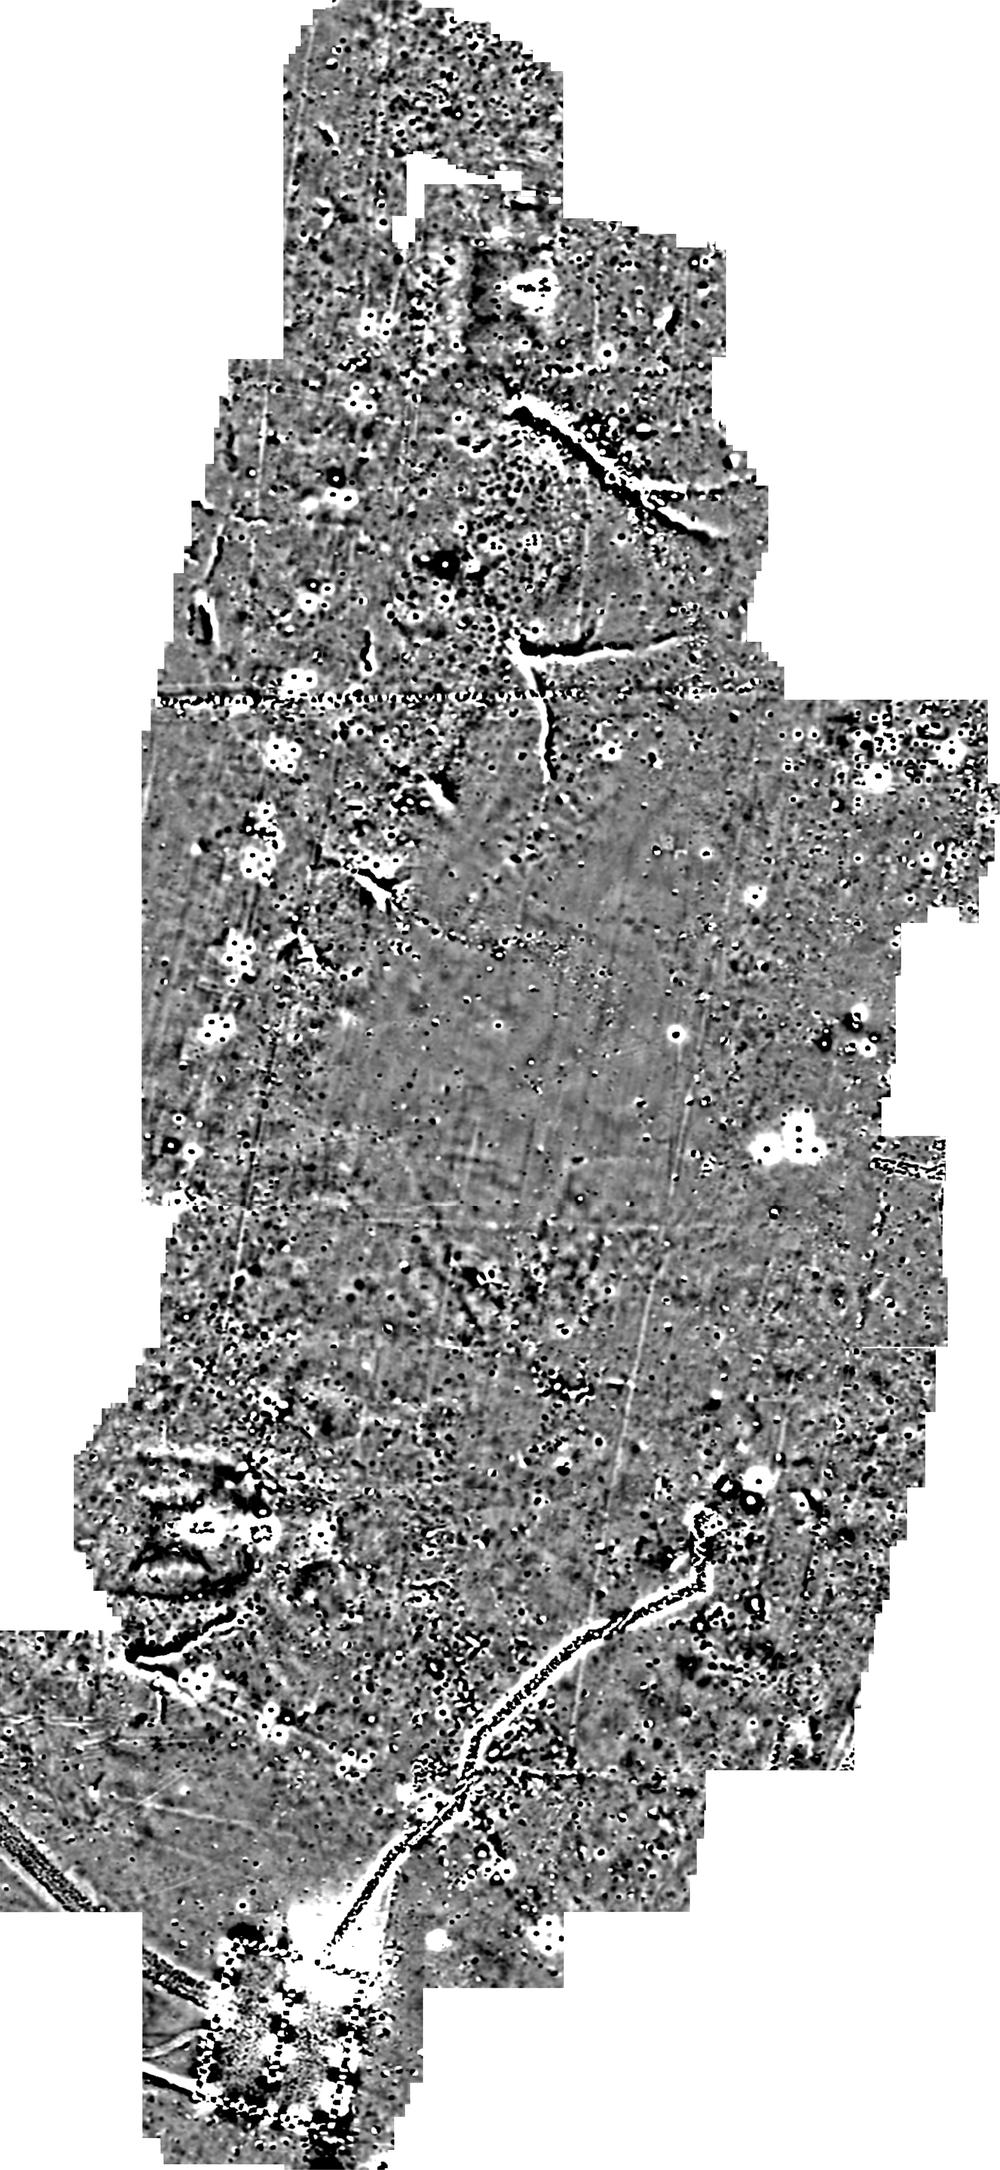 Figure 15. Moderate contrast (5/-5nT).